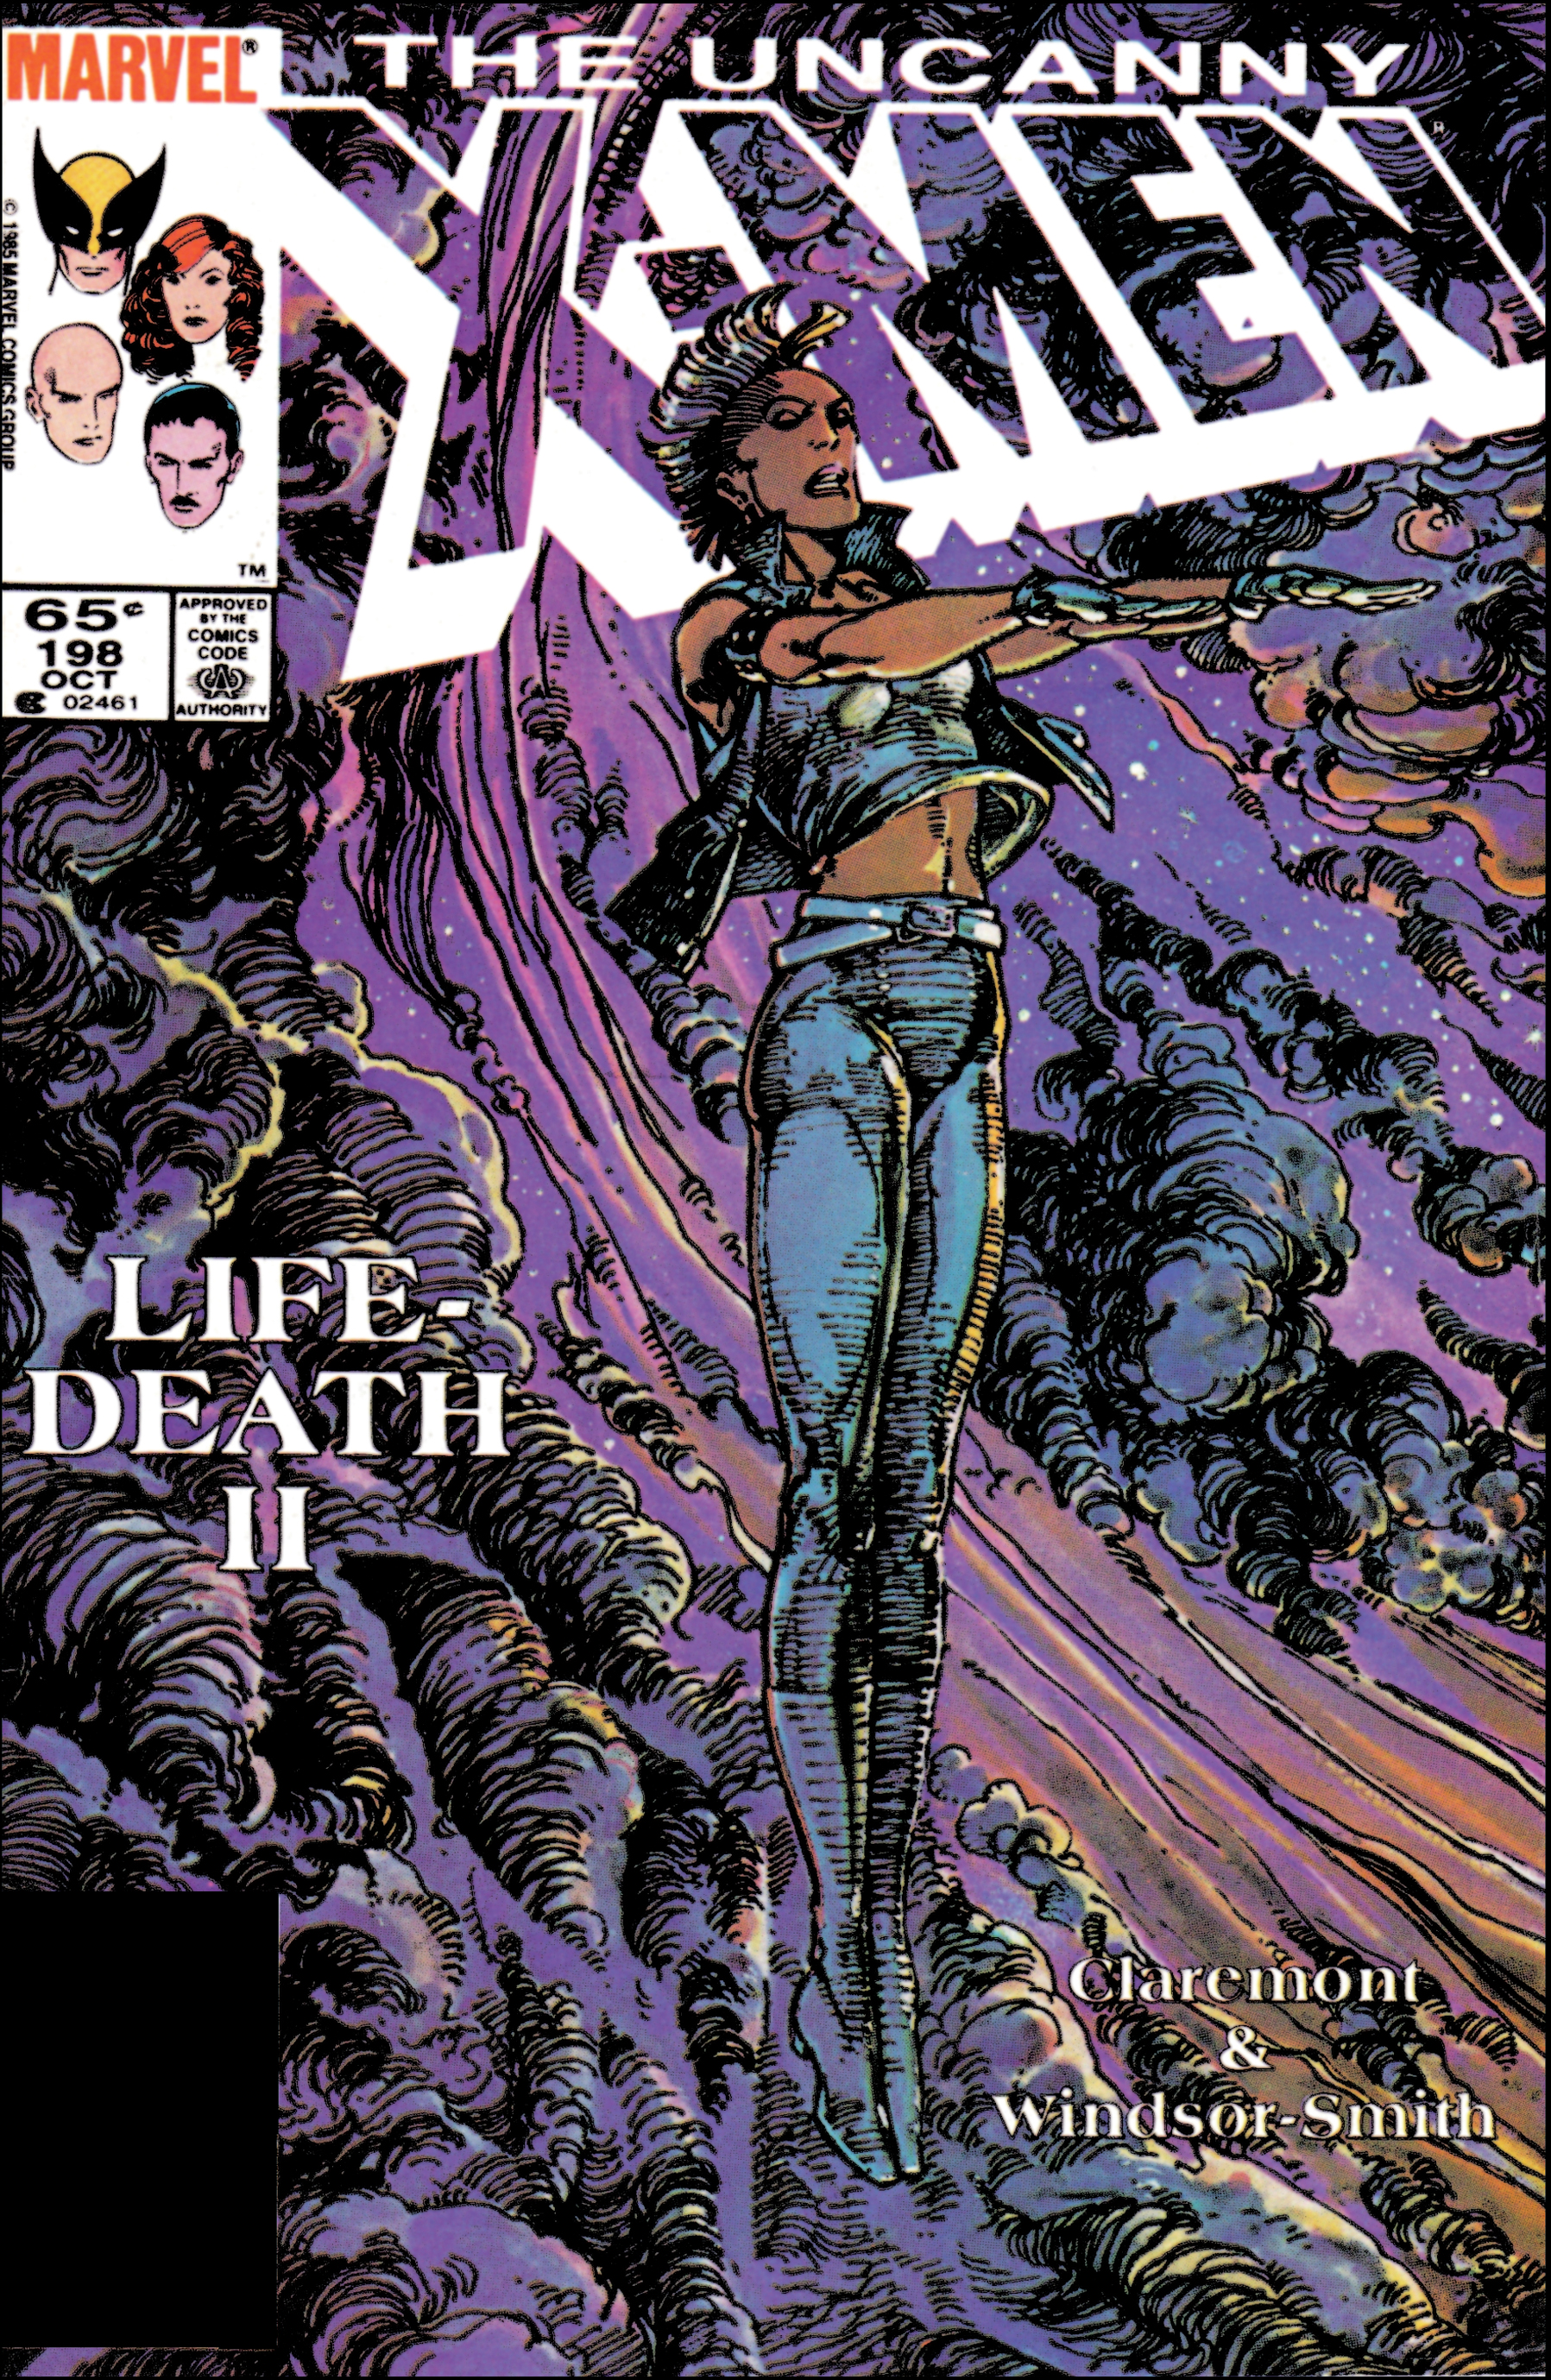 Uncanny X-Men (1963) #198